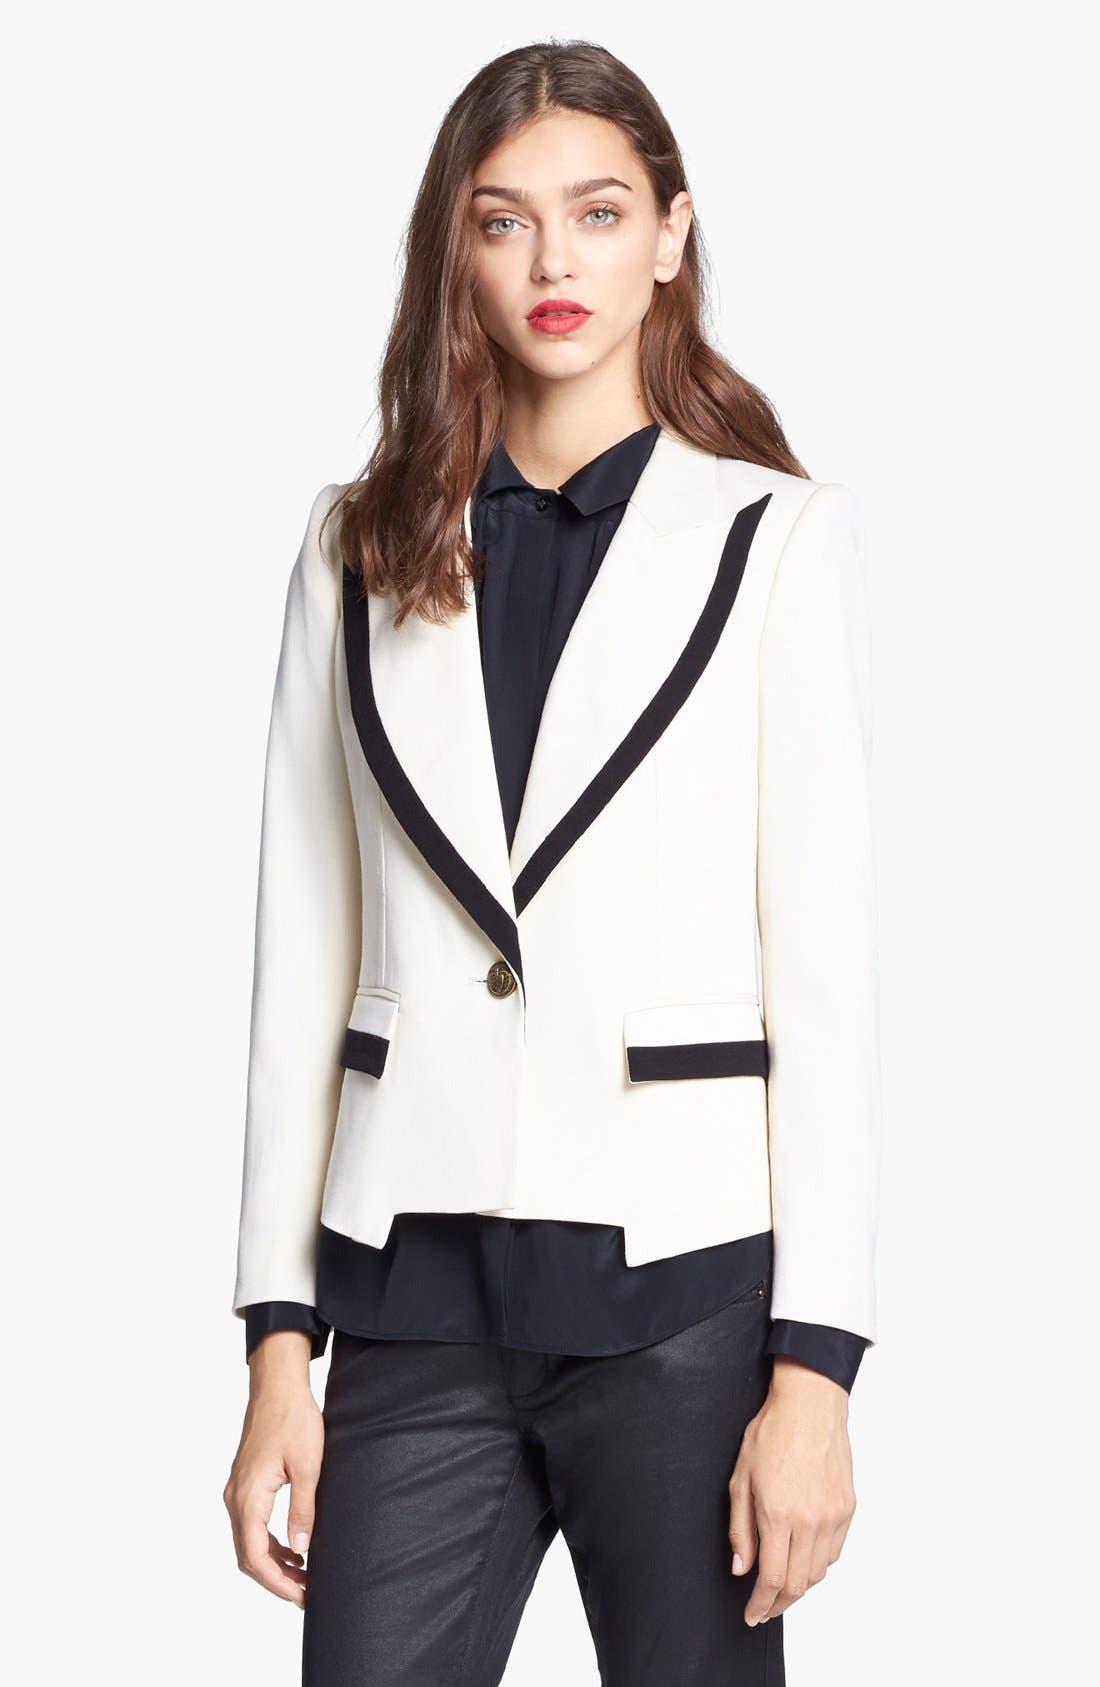 Main Image - Rachel Zoe 'Foster' Peak Lapel Single Button Jacket